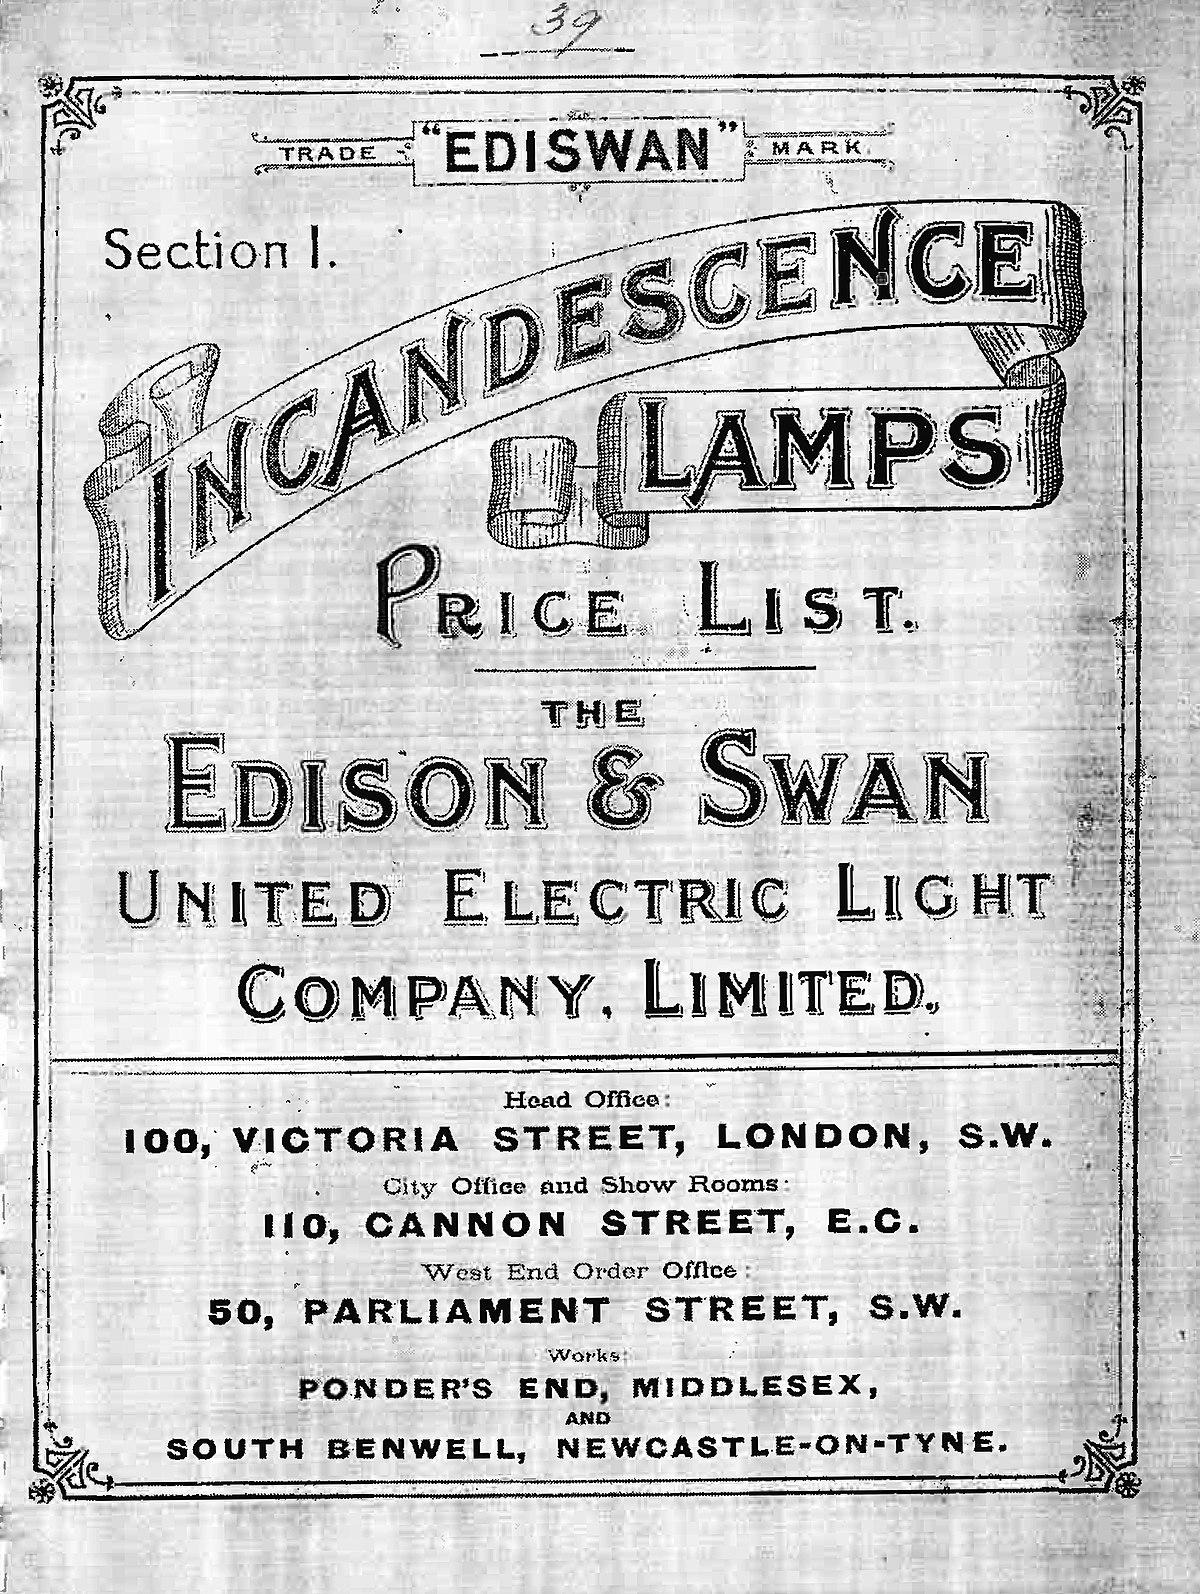 edison and swan electric light company - wikipedia